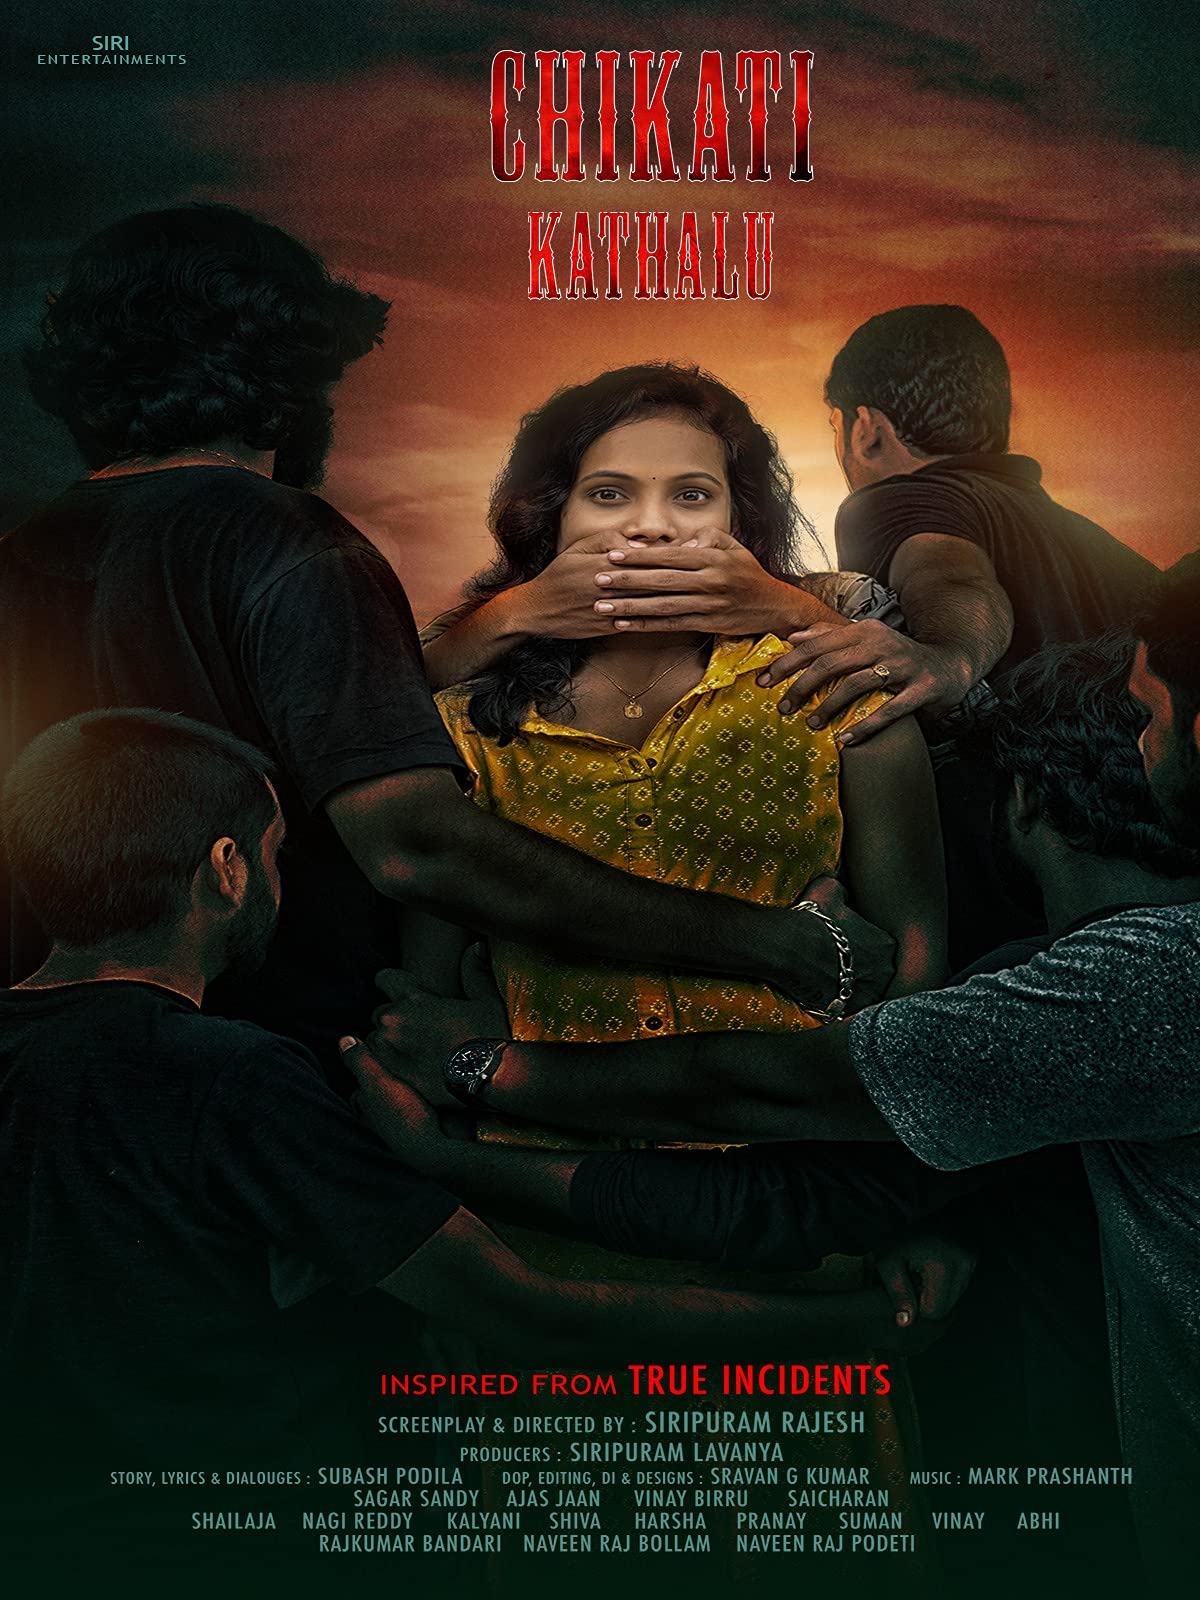 Chikati Kathalu